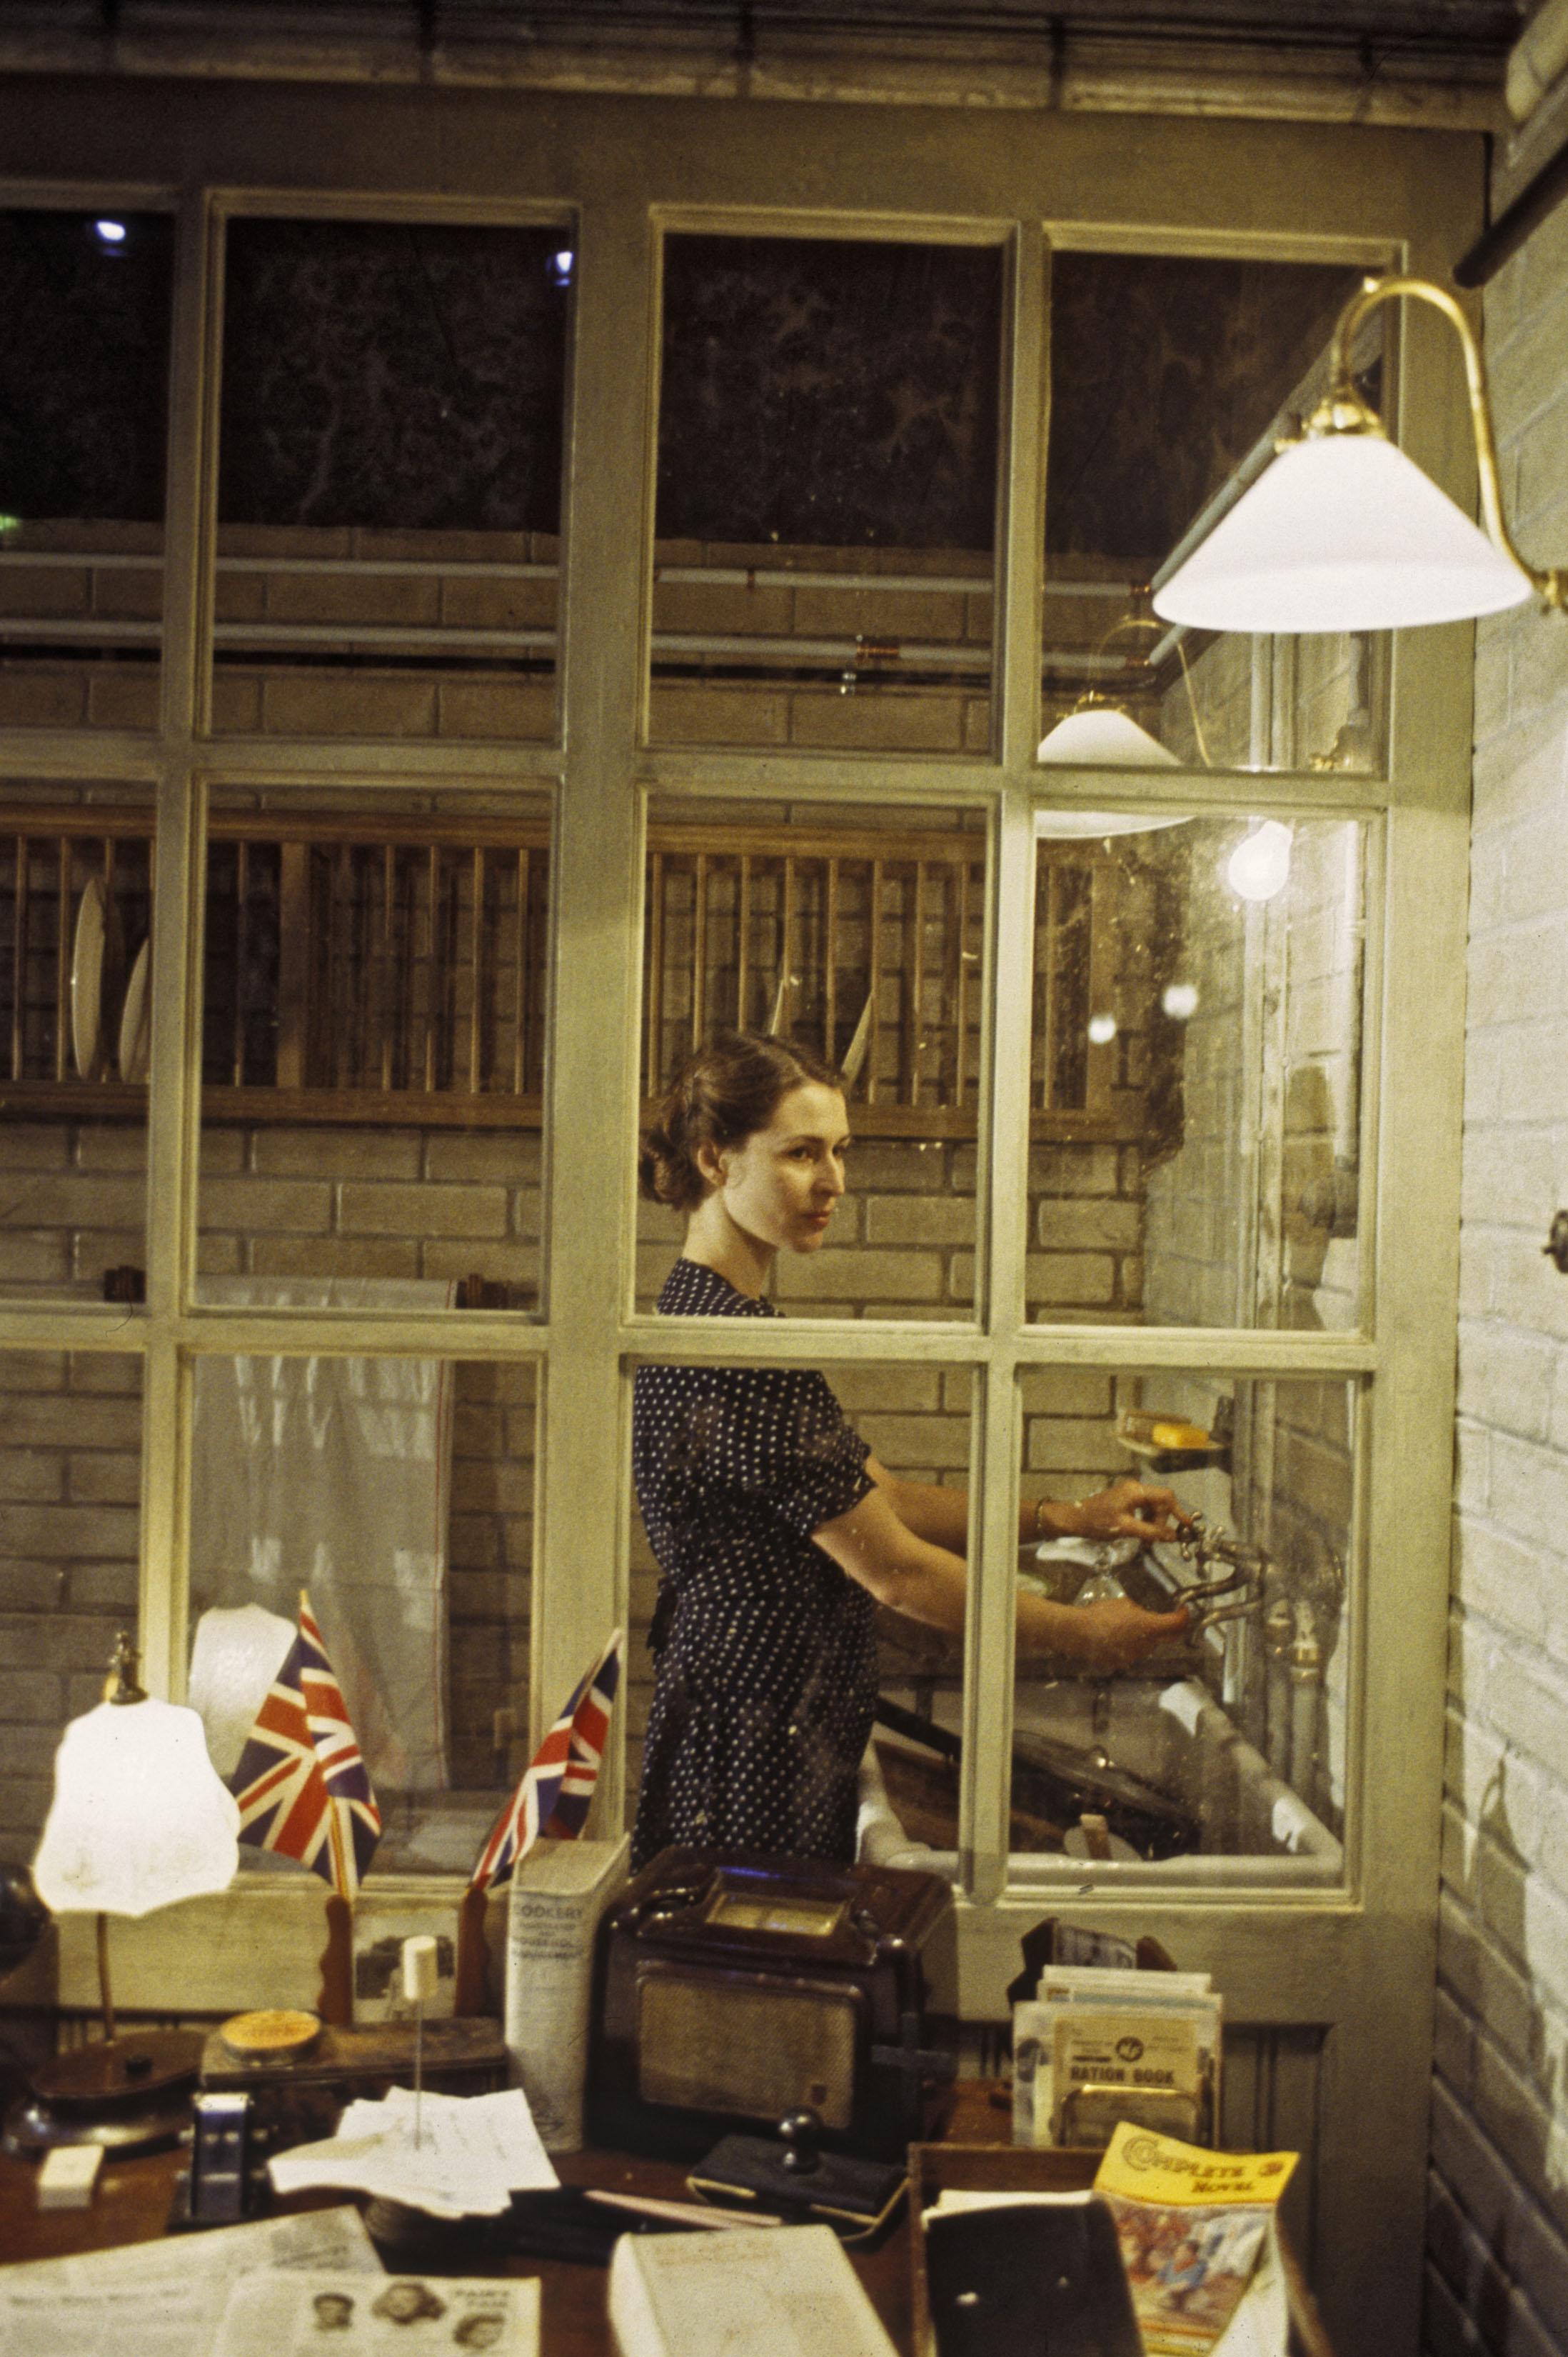 After Miss Julie-Donmar Warehouse 010.jpg